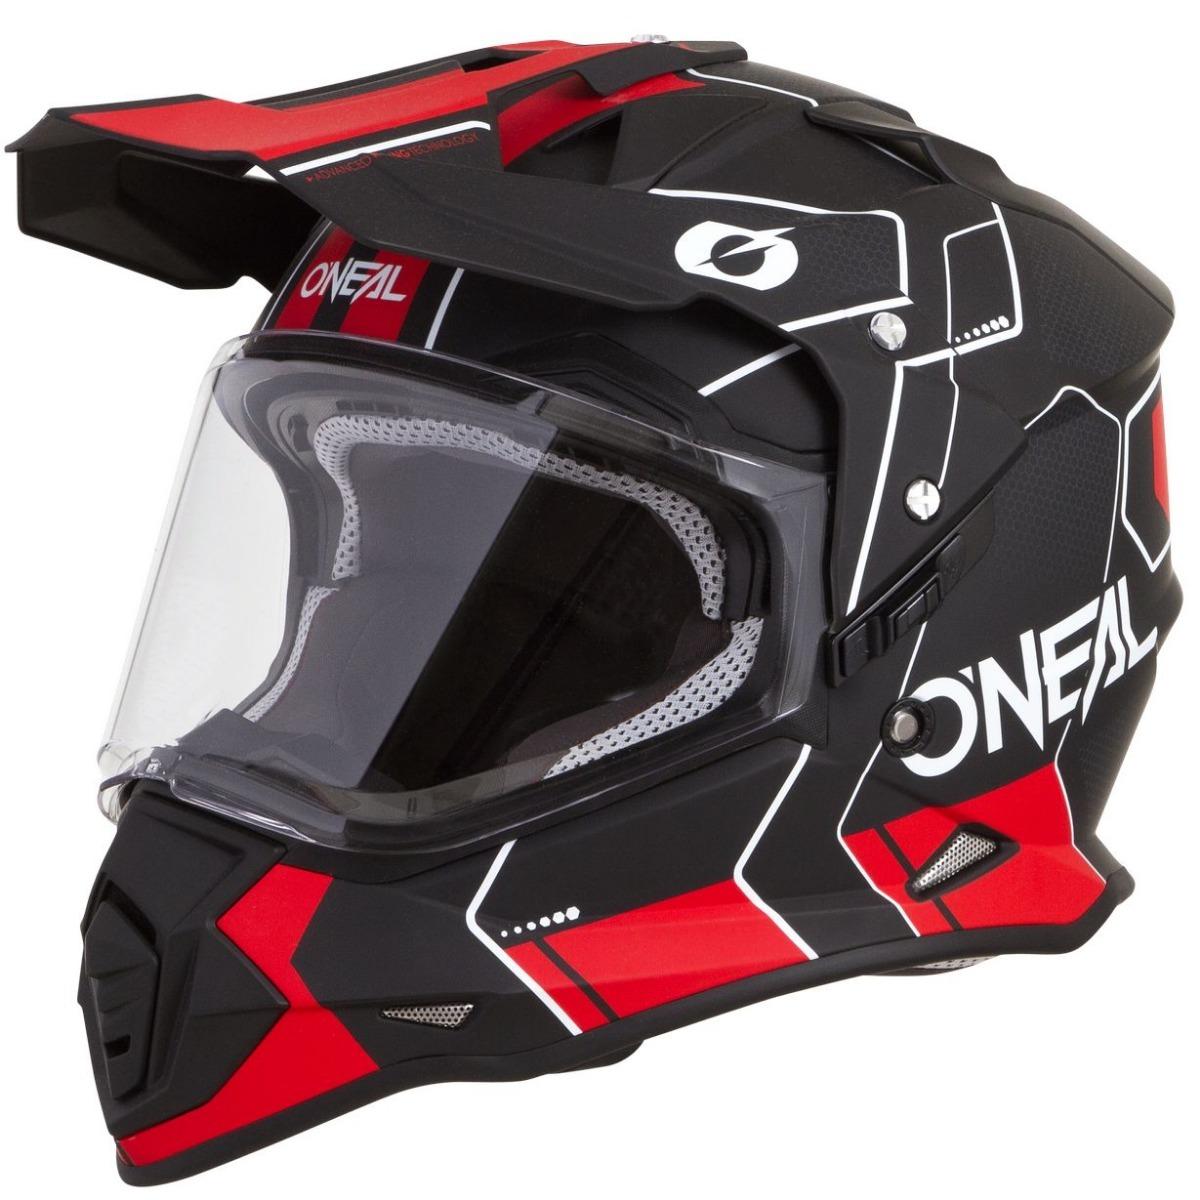 6e89ab85e2761 casco de cross oneal sierra 2 negro rojo m marelli. Cargando zoom.